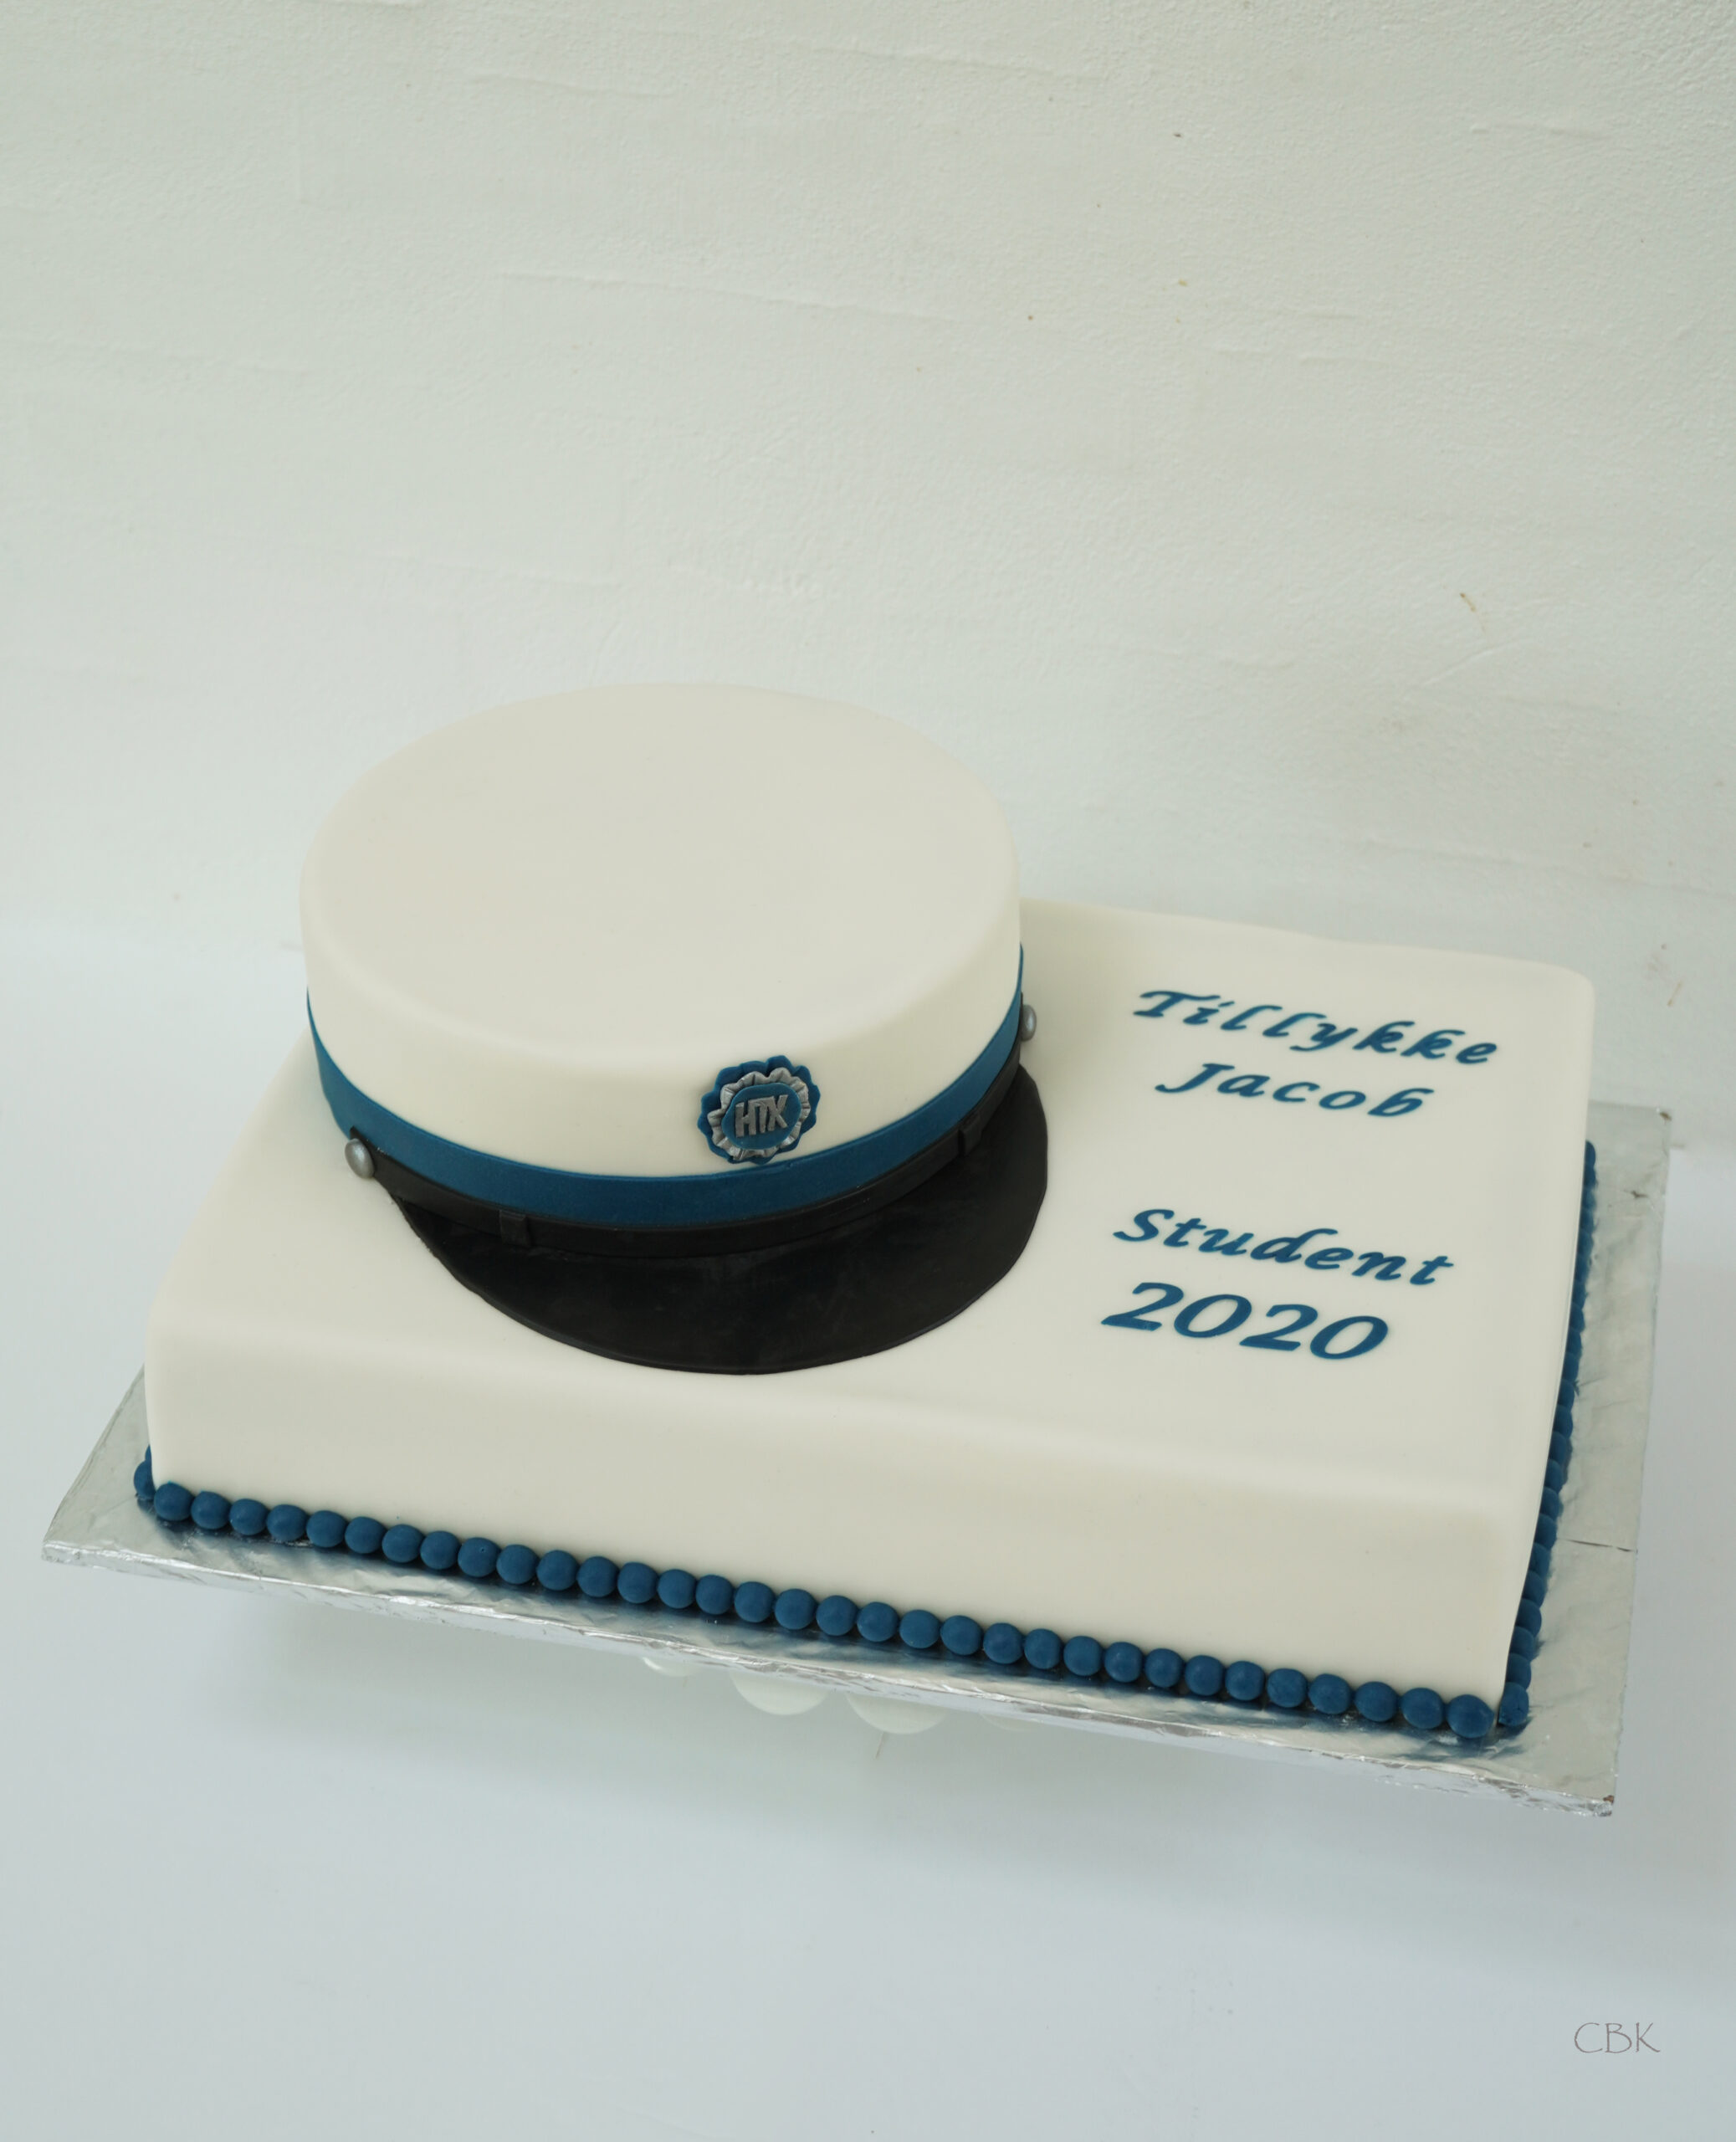 htxstudent blå kage